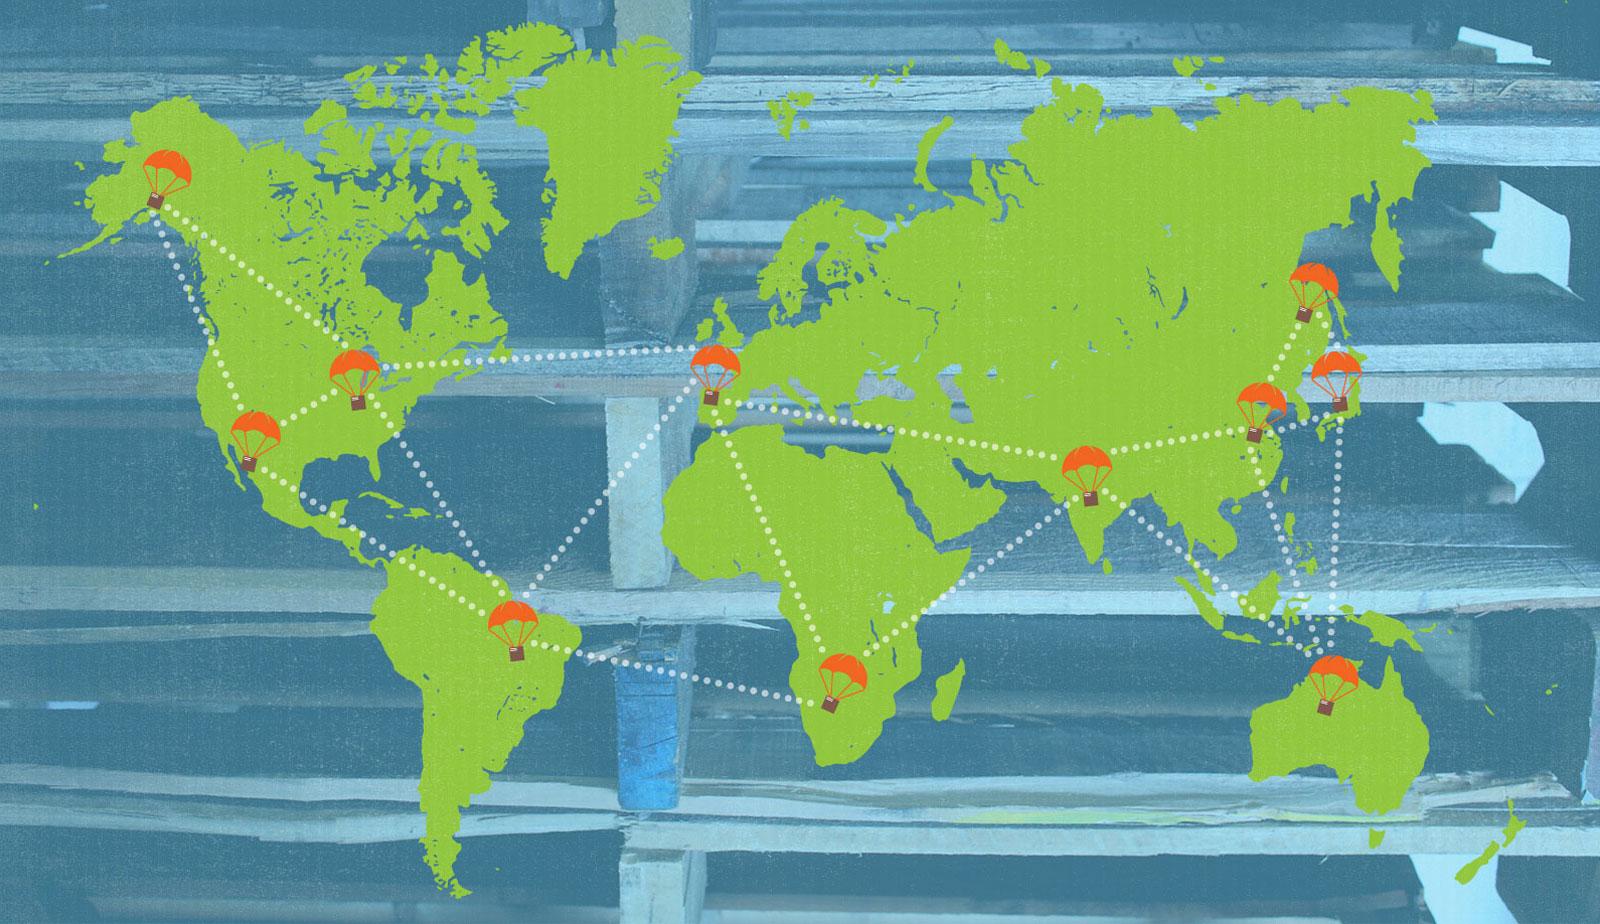 Overture Global Network